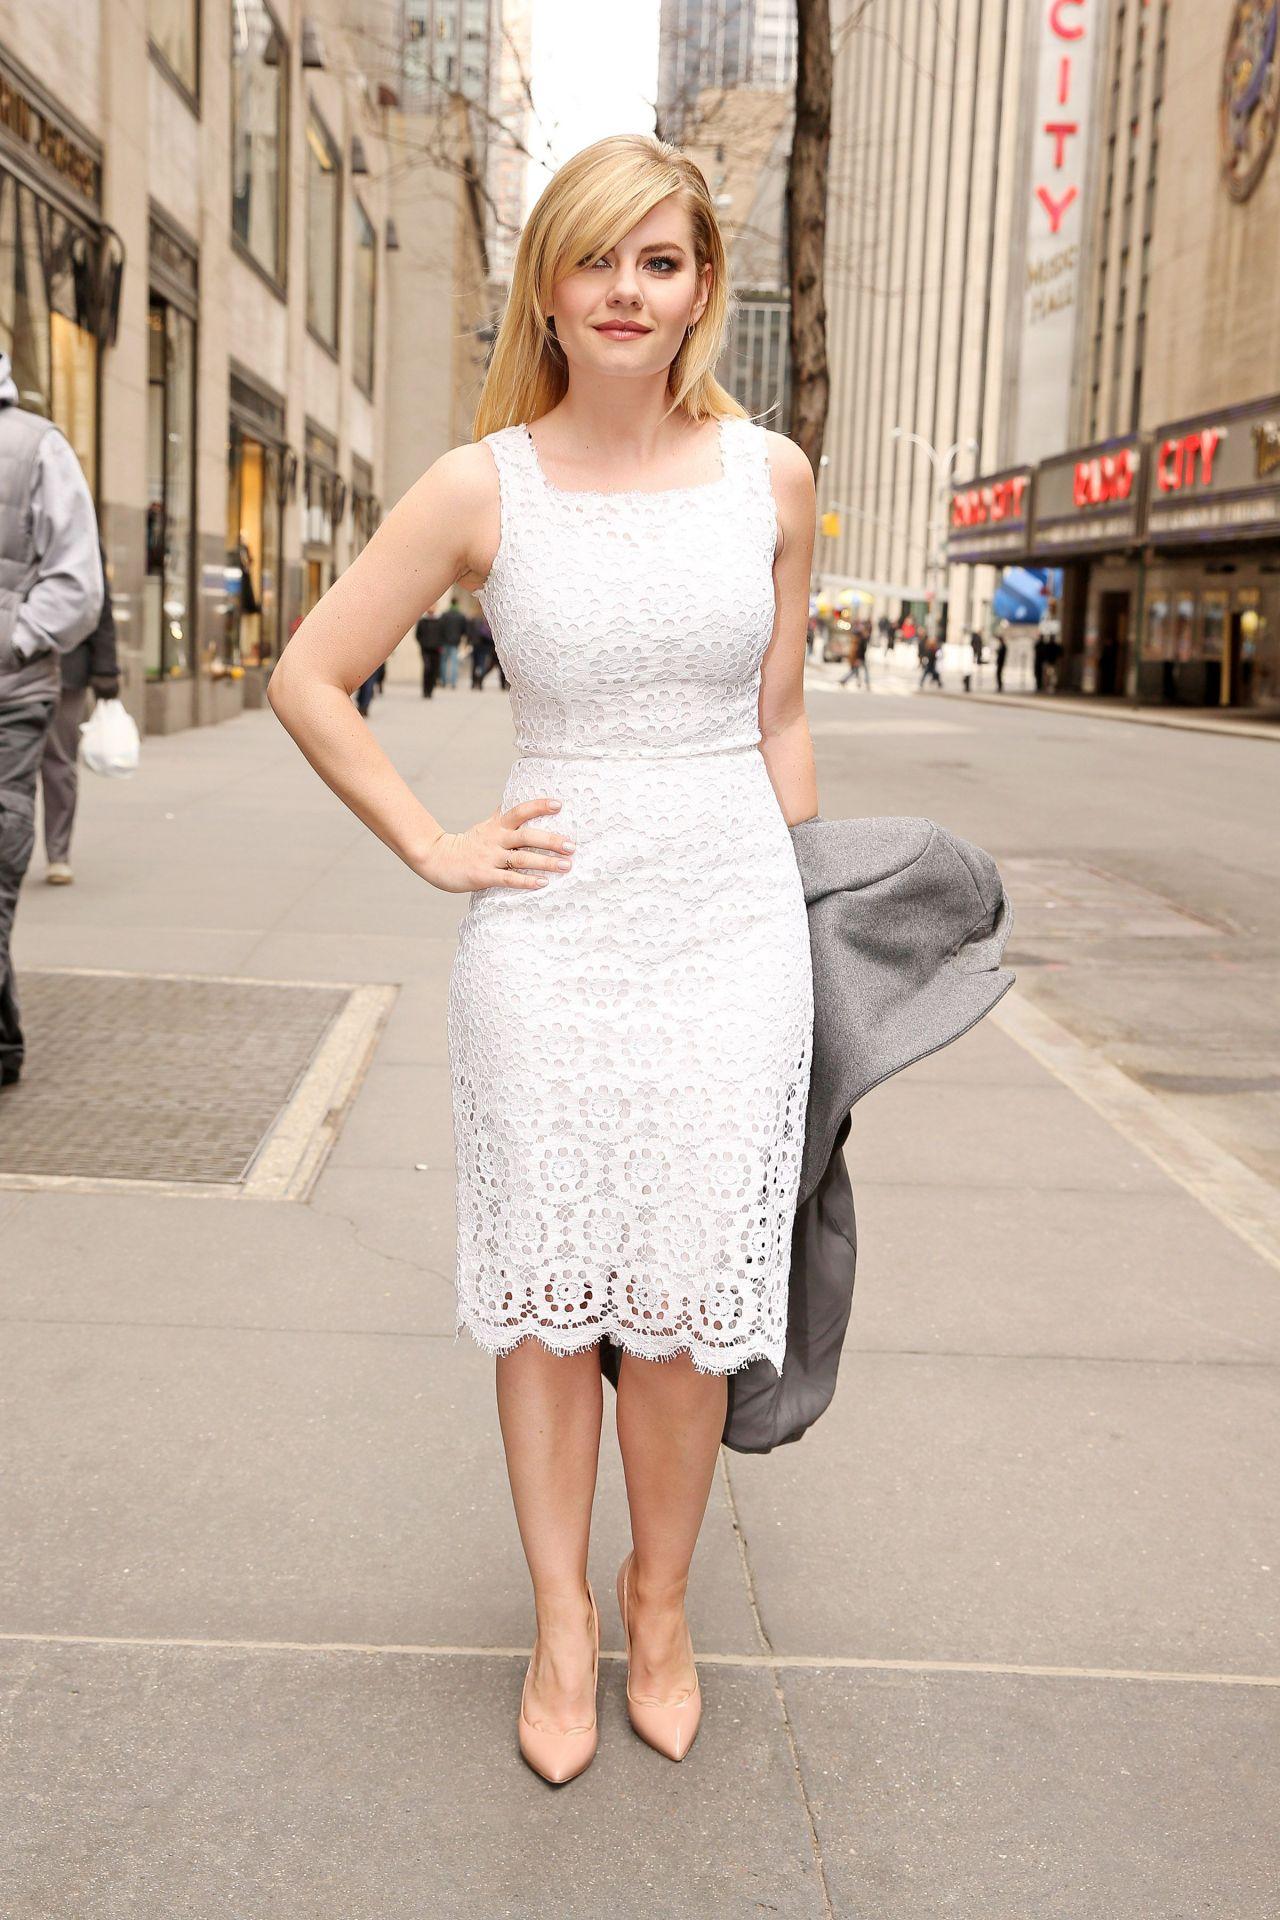 Elisha Cuthbert Style Leaving Nbc Studios In New York